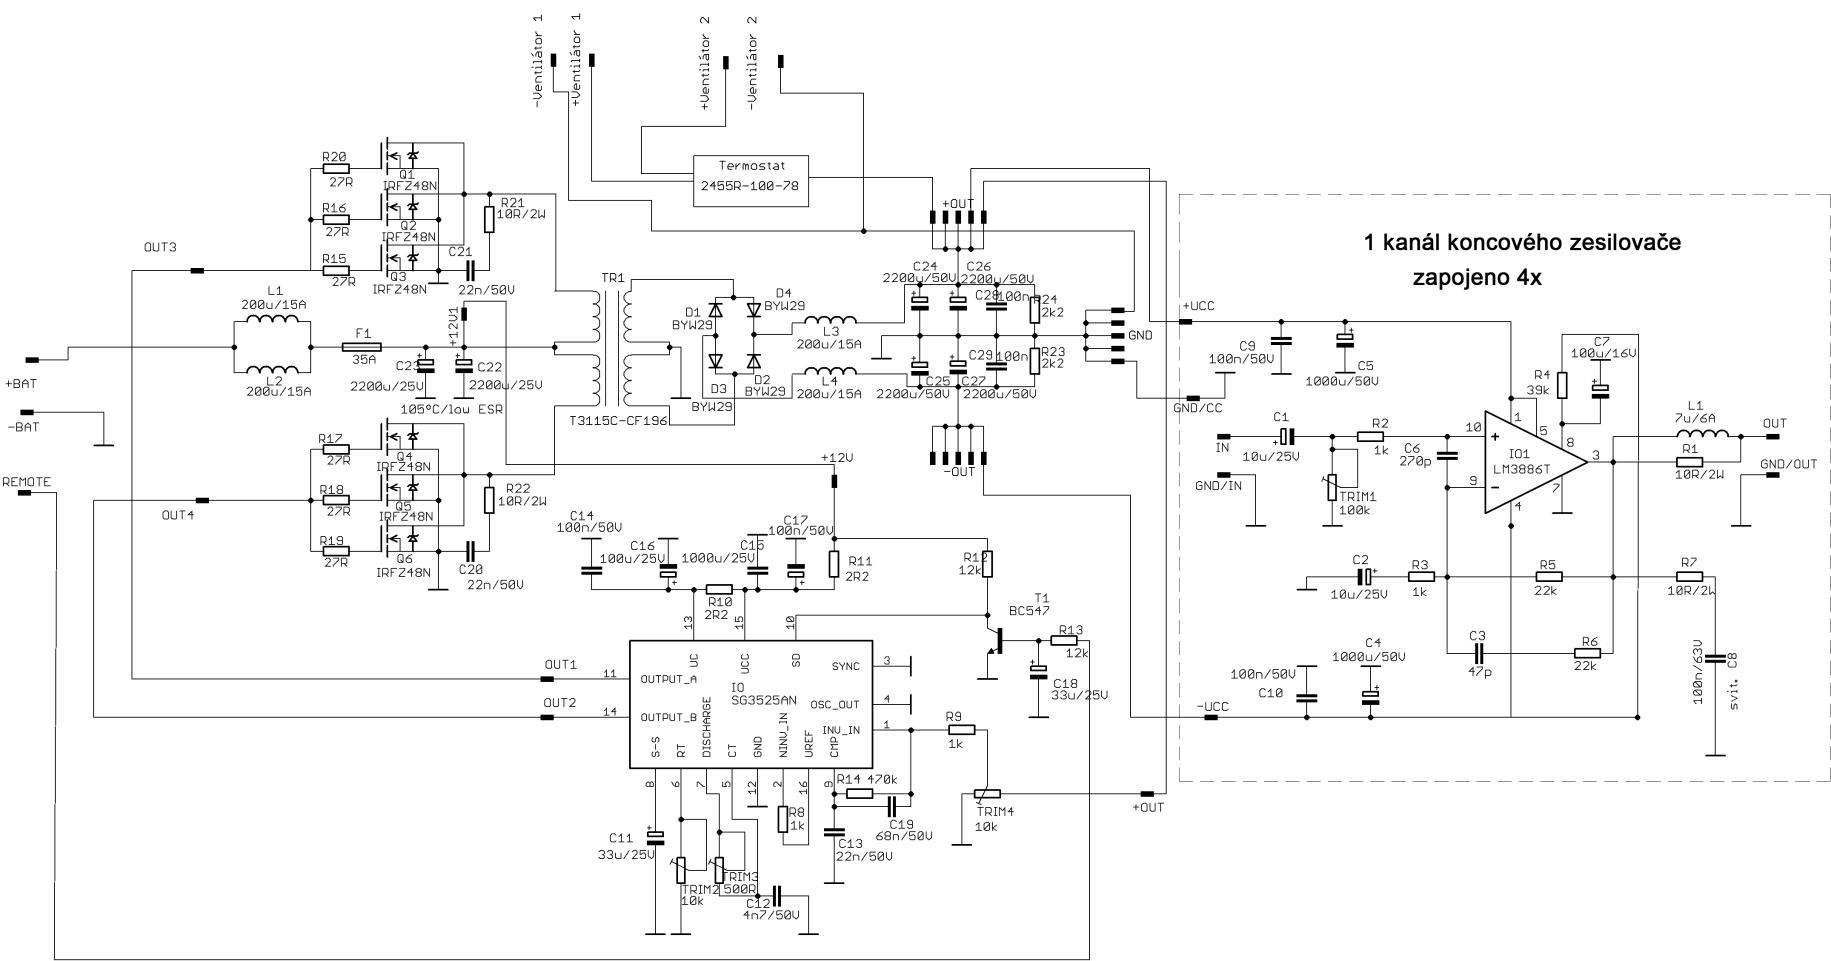 Dc Car Circuits Wiring Diagram Electricity Basics 101 Simple Circuit 4x60w Amplifier Lm3886 Sg3525 Converter Rh 320volt Com Motor Control